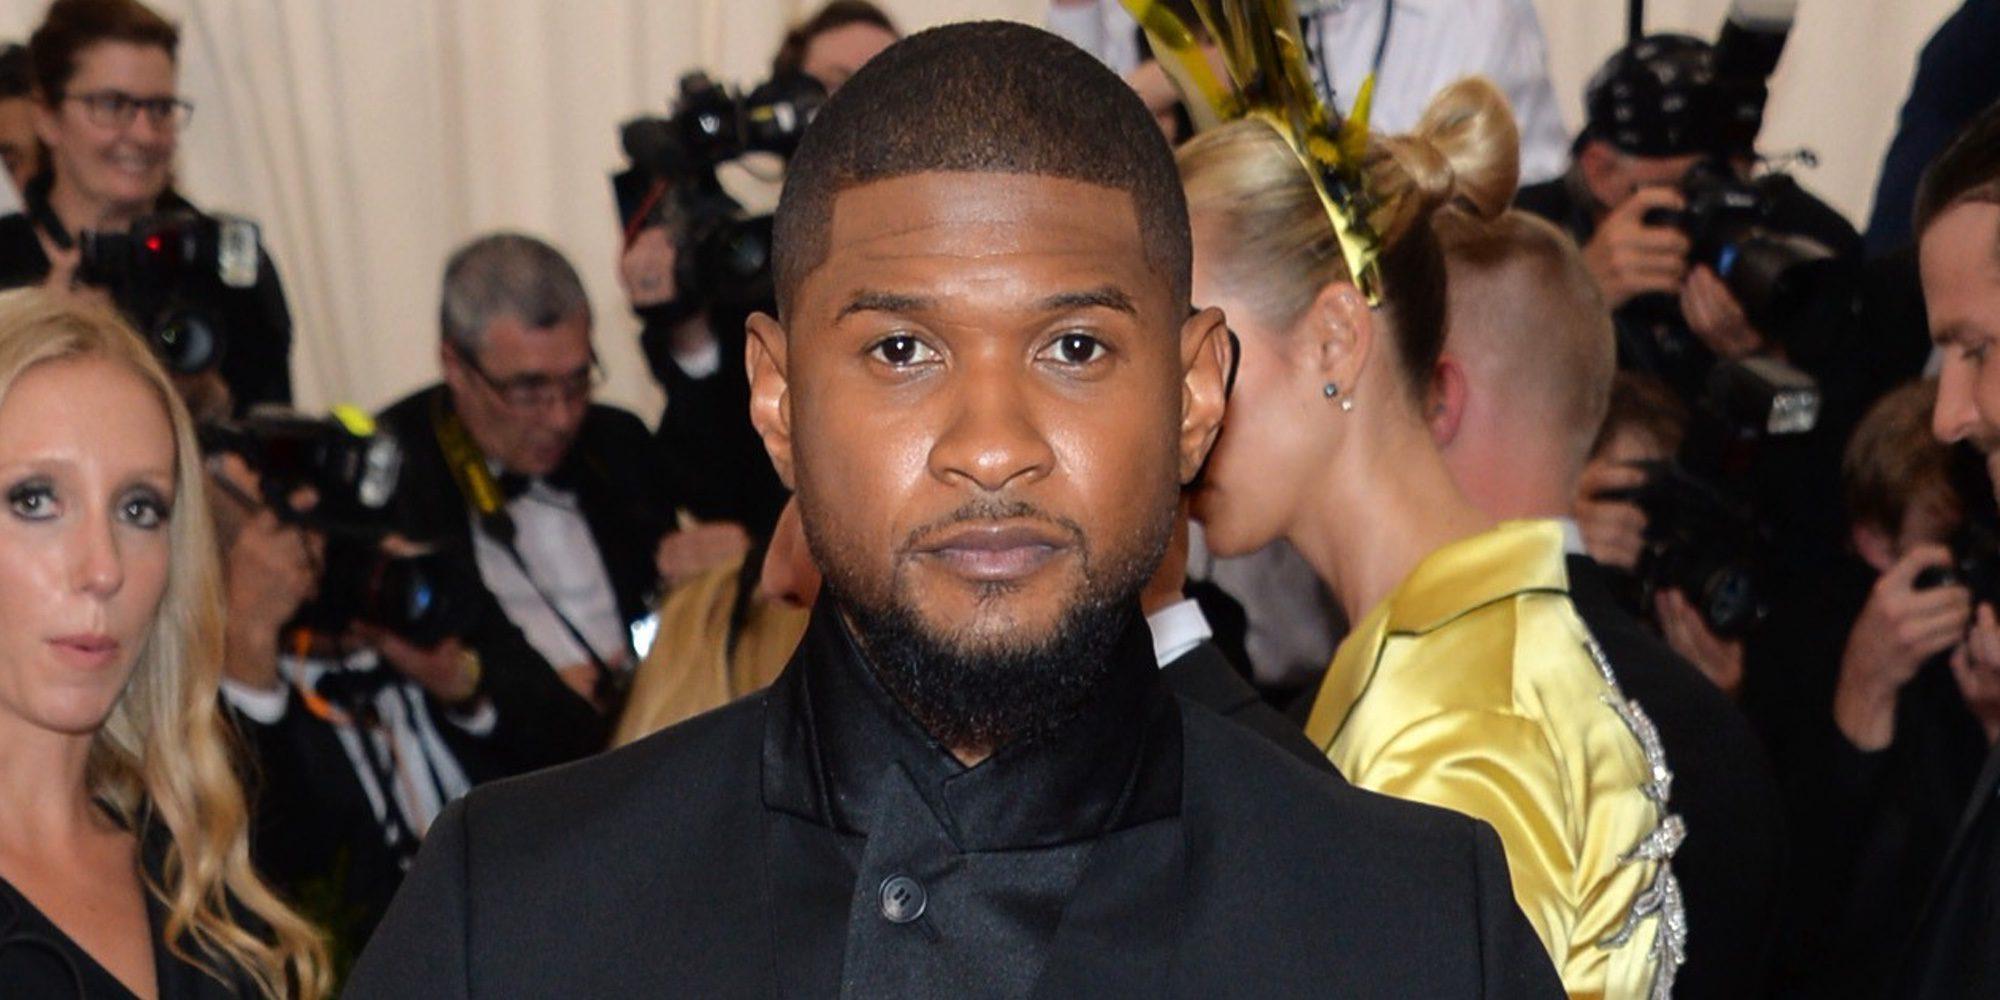 Usher volverá a enfrentarse a la justicia por tercera vez consecutiva al transmitir una ETS